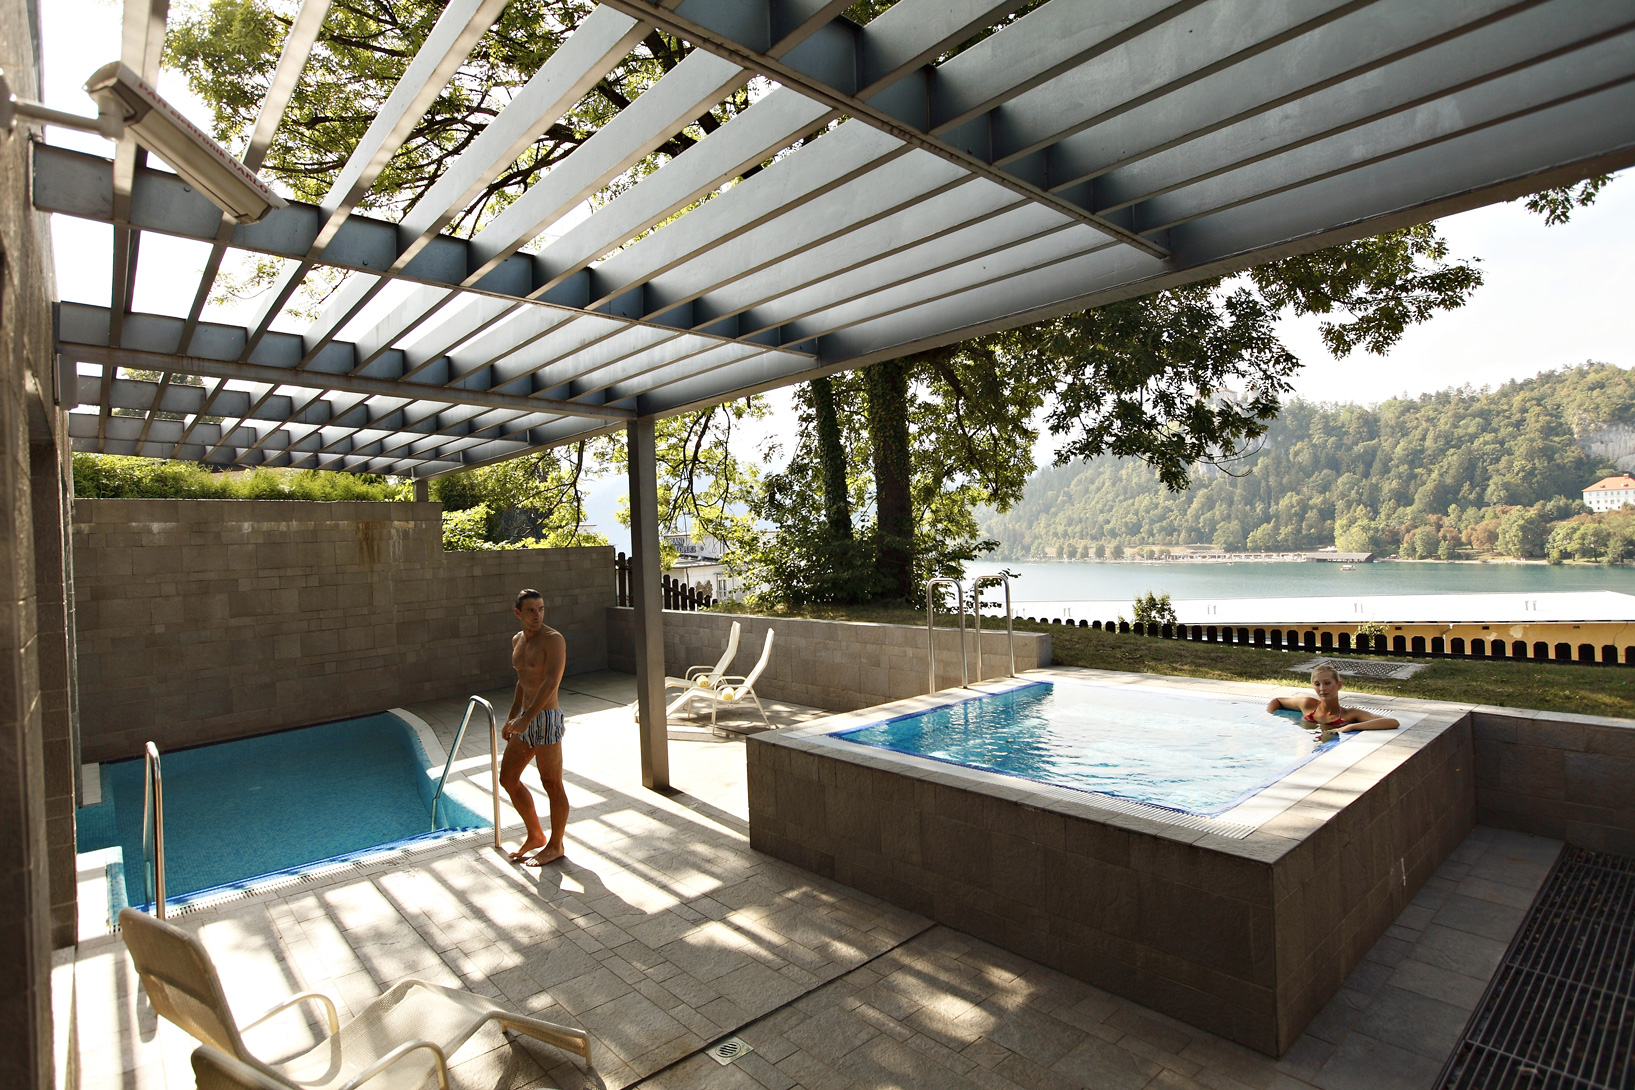 Outdoor-pools_04_ZWC_RikliBalanceHotel_Foto-AV_11-09_low res